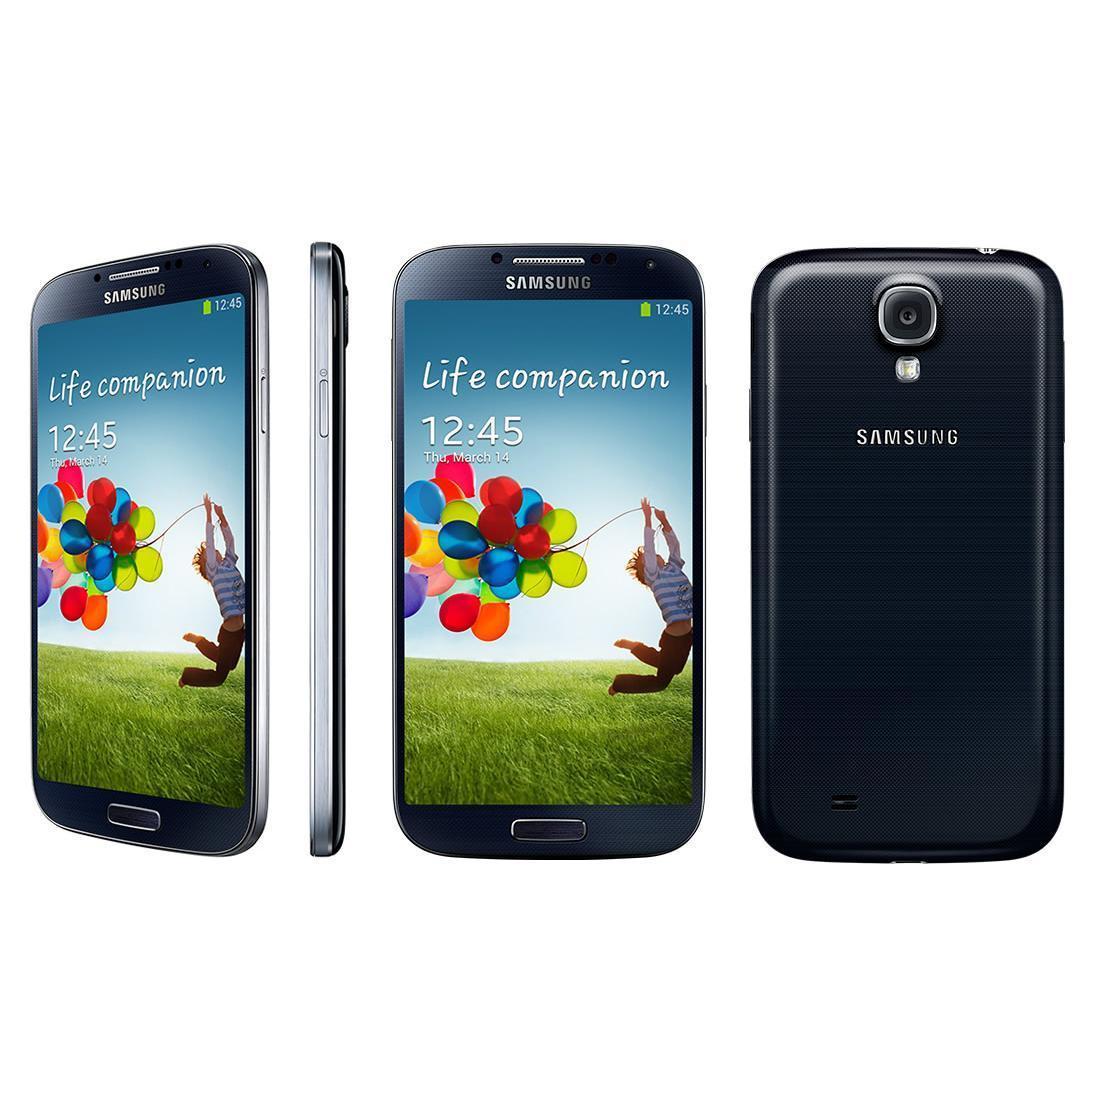 Samsung Galaxy S4 16 Go i9505 4G - Noir - SFR